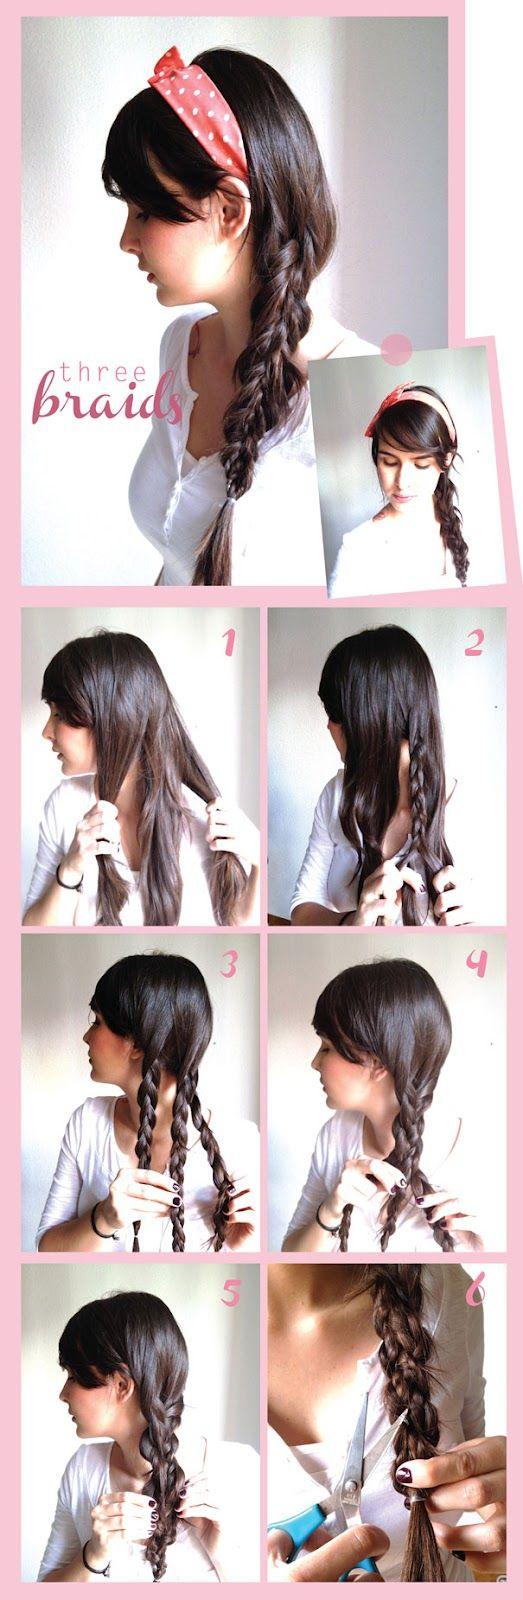 Three braids - idea for styling Ellie's hair.